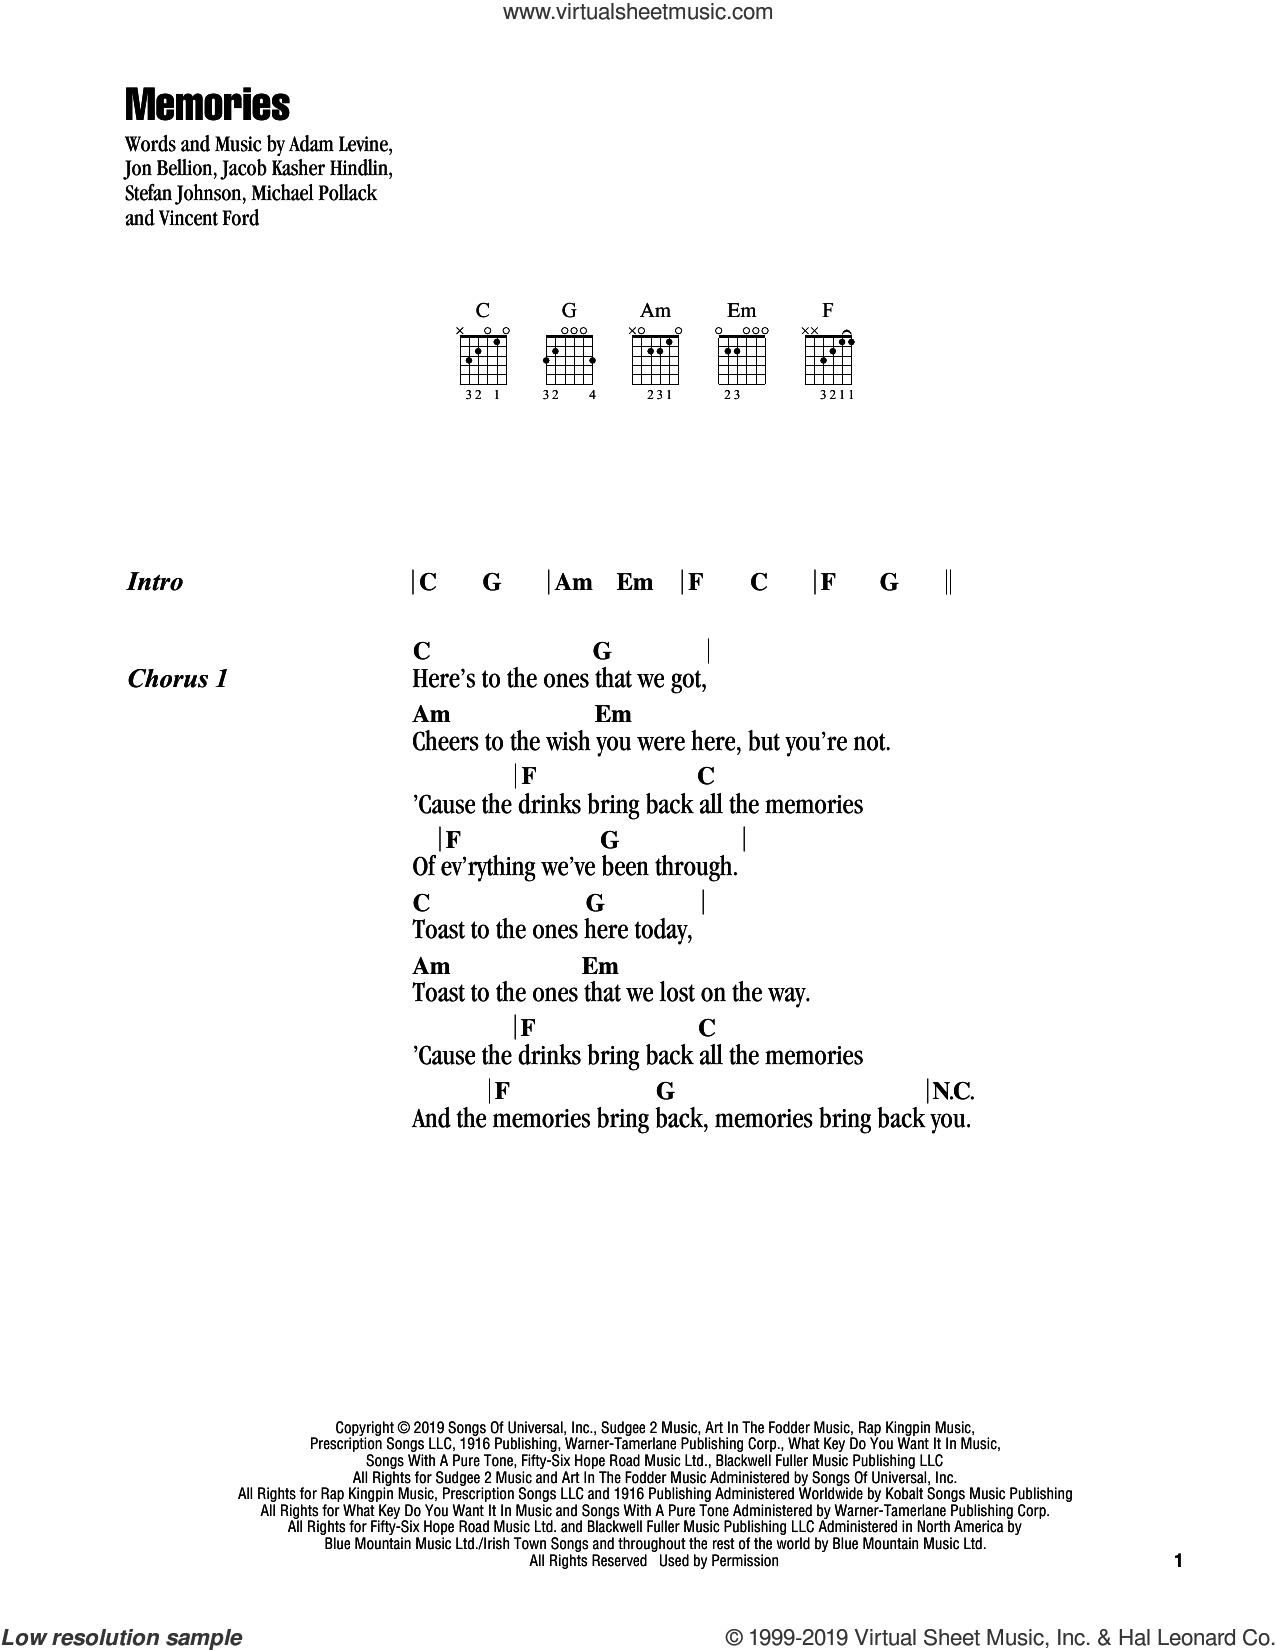 5 Memories Sheet Music For Guitar Chords Pdf